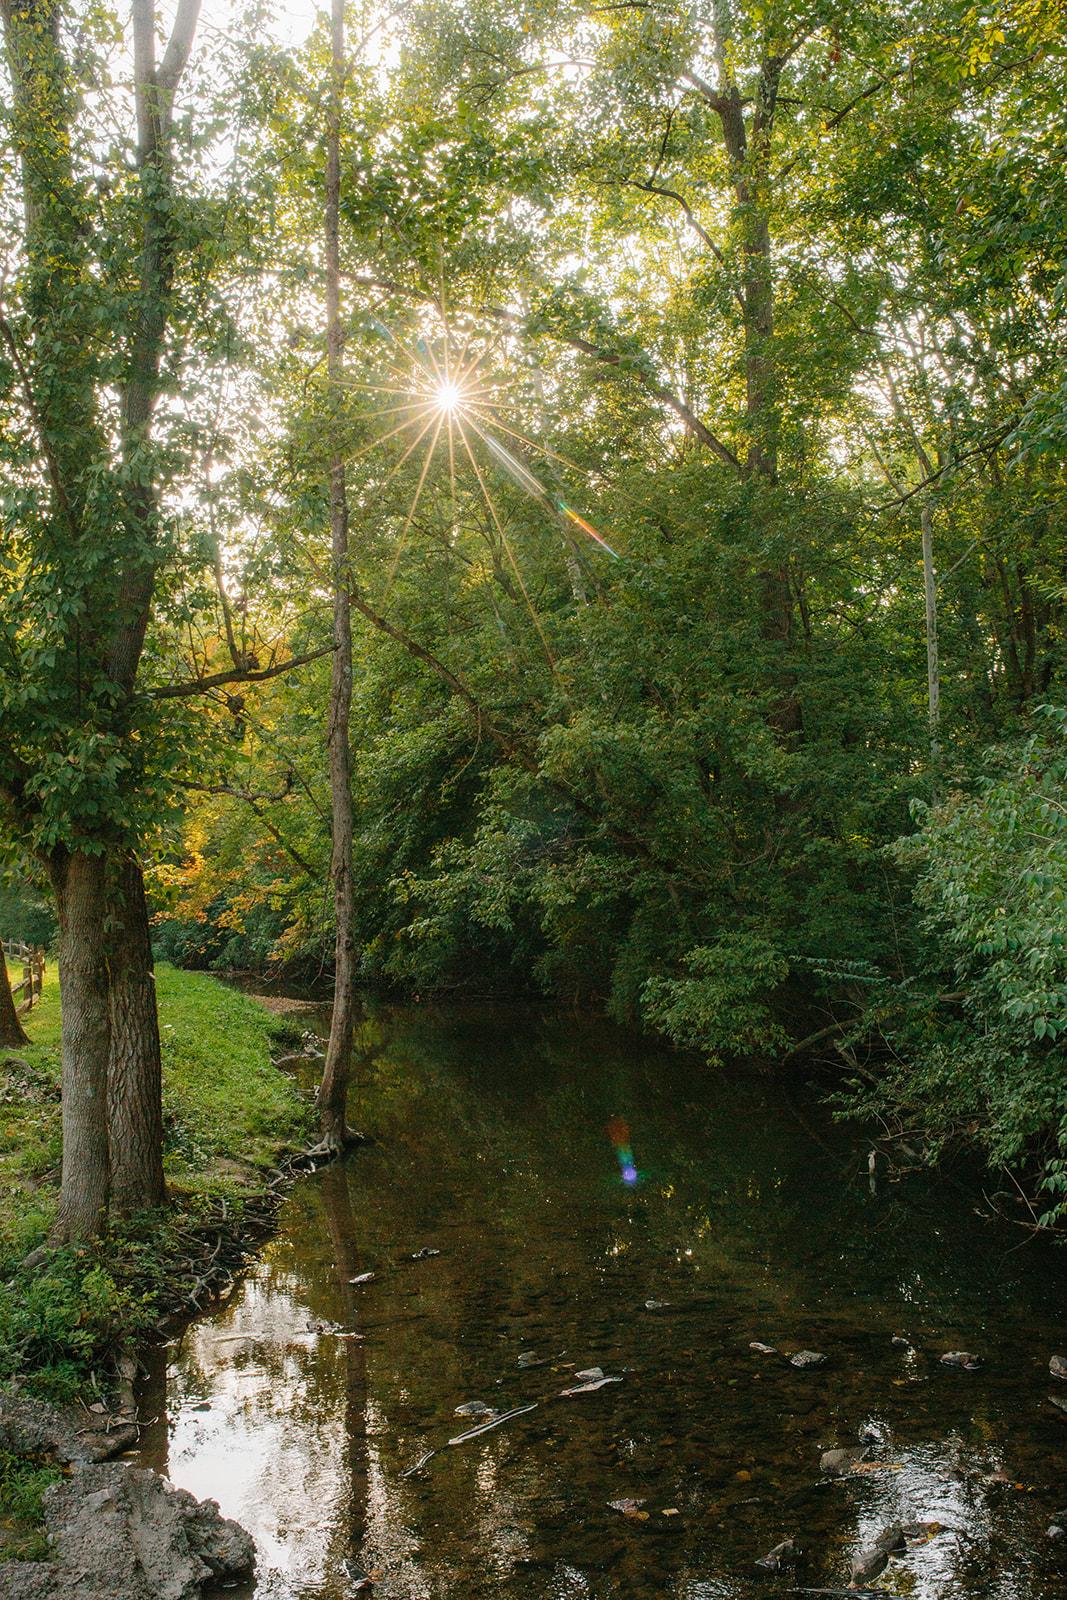 greenwood-049.jpg